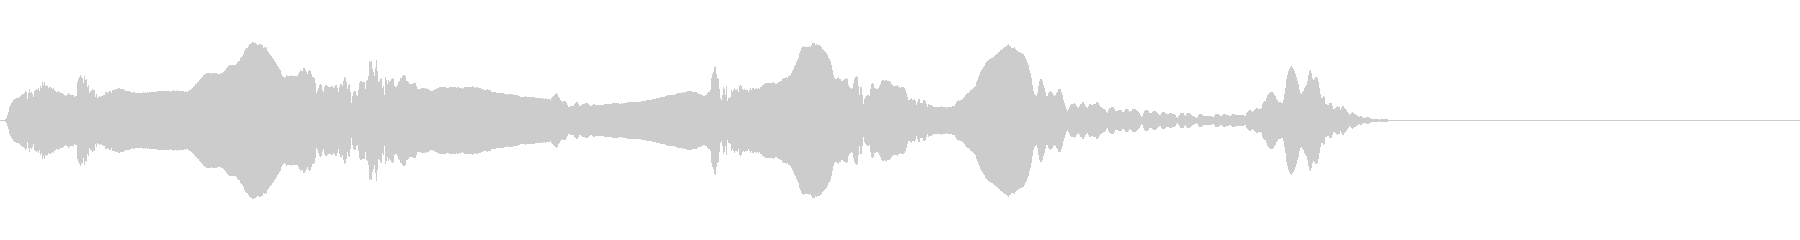 尺八 生演奏 古典風#14の未再生の波形